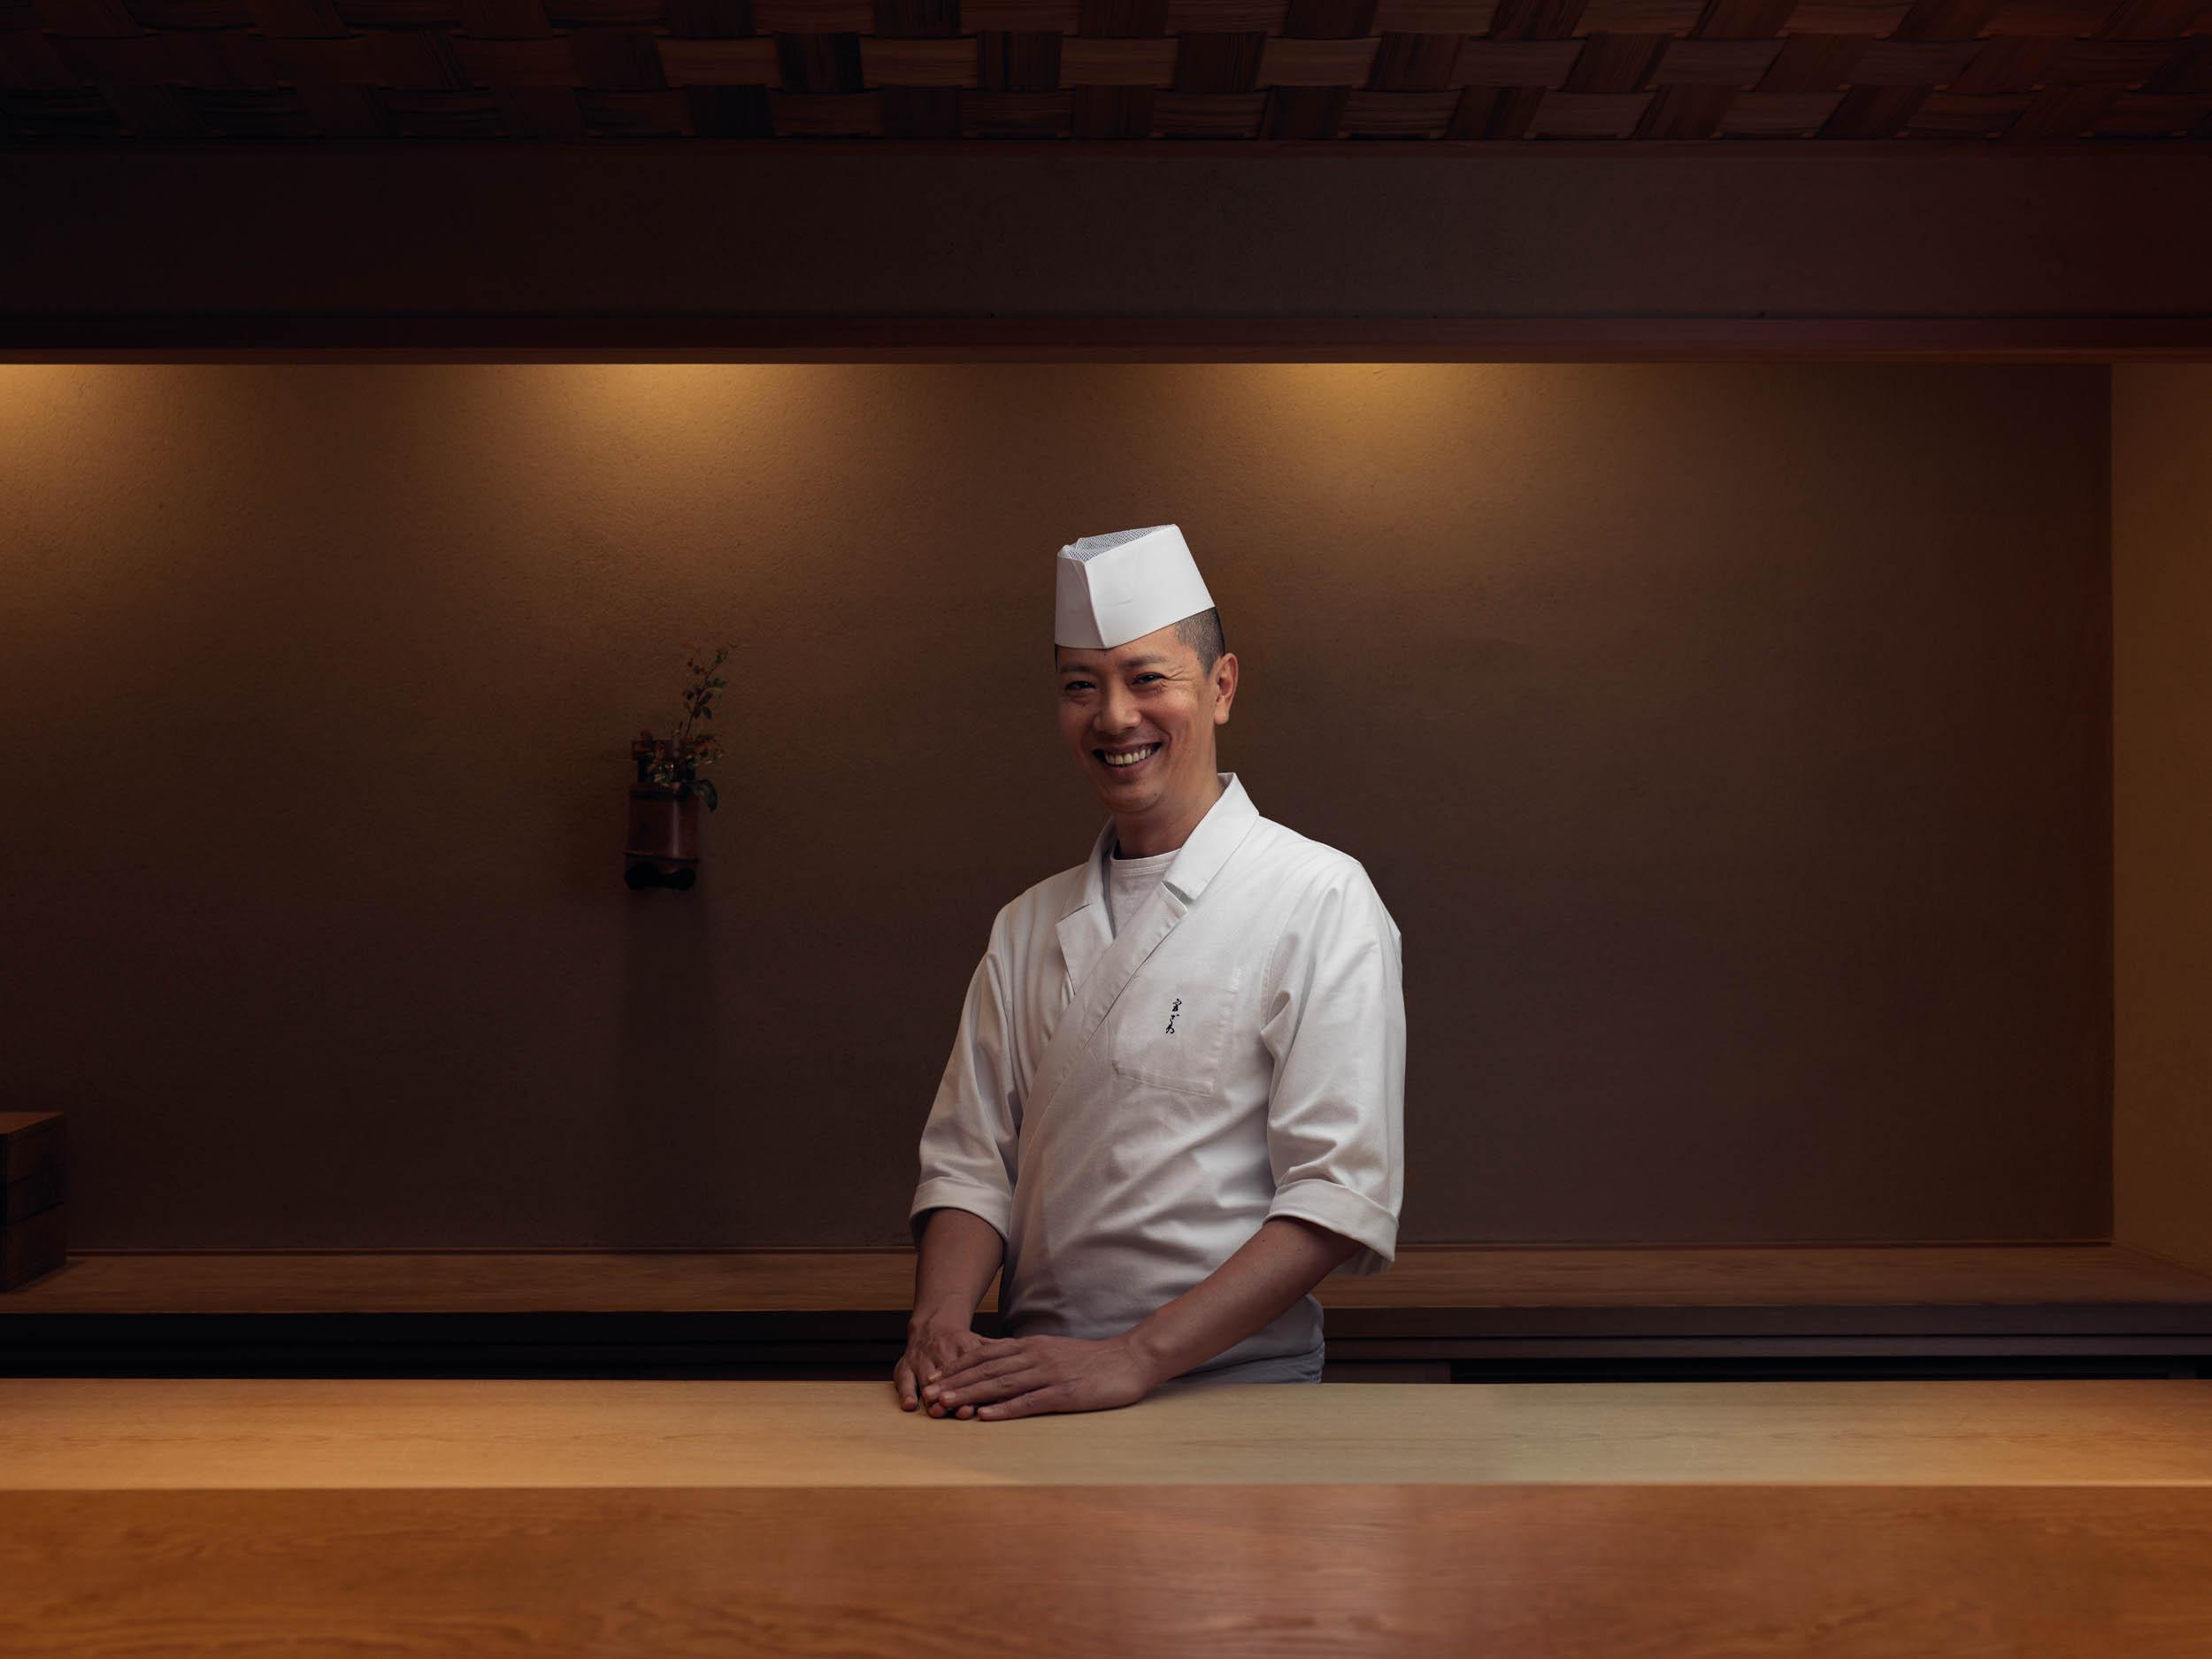 2018 09 22 - Chef - Godan Miyazawa.jpg